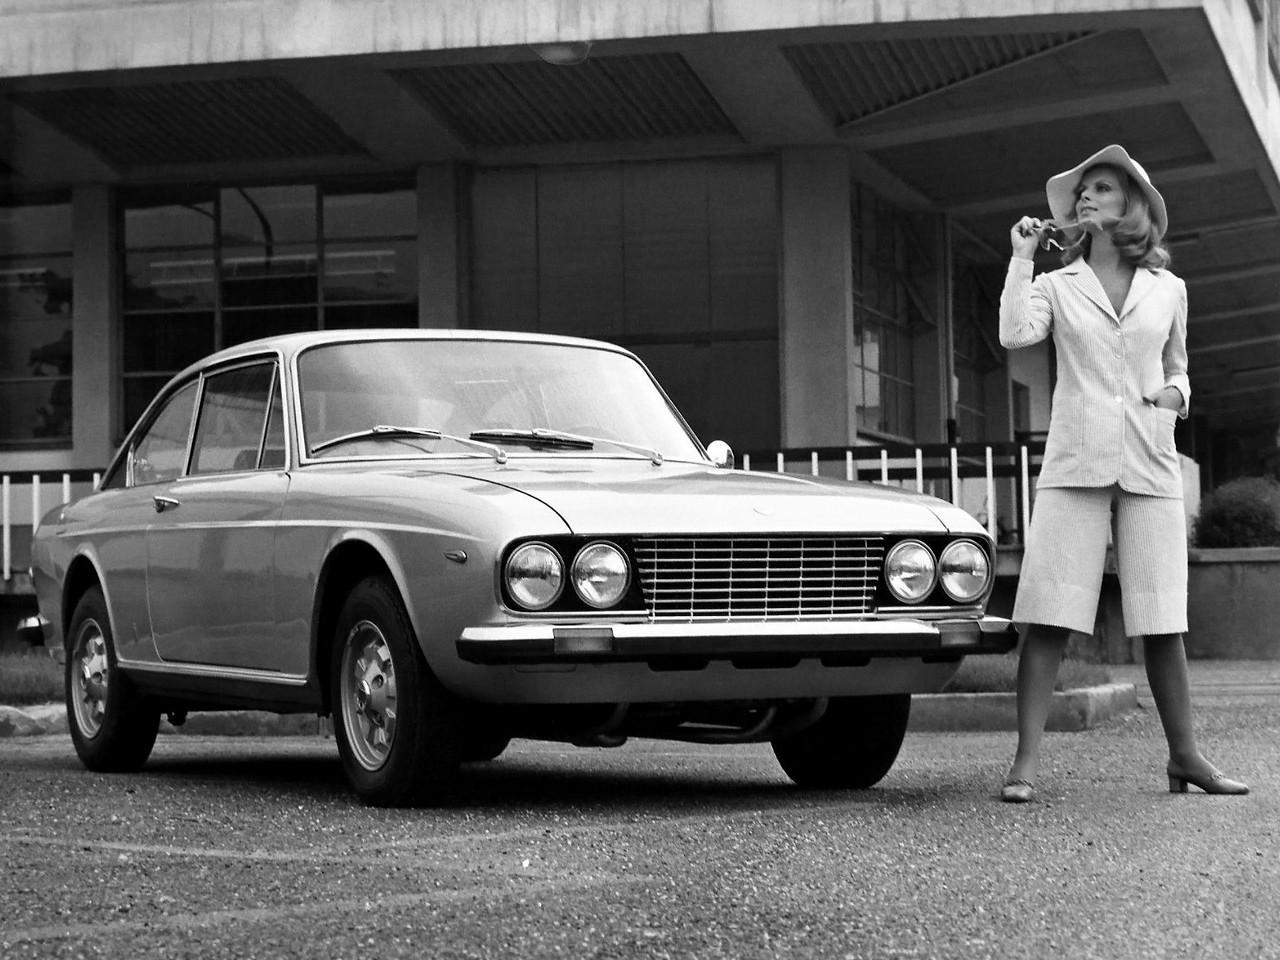 https://s1.cdn.autoevolution.com/images/gallery/LANCIA-2000-Coupe-3372_10.jpg